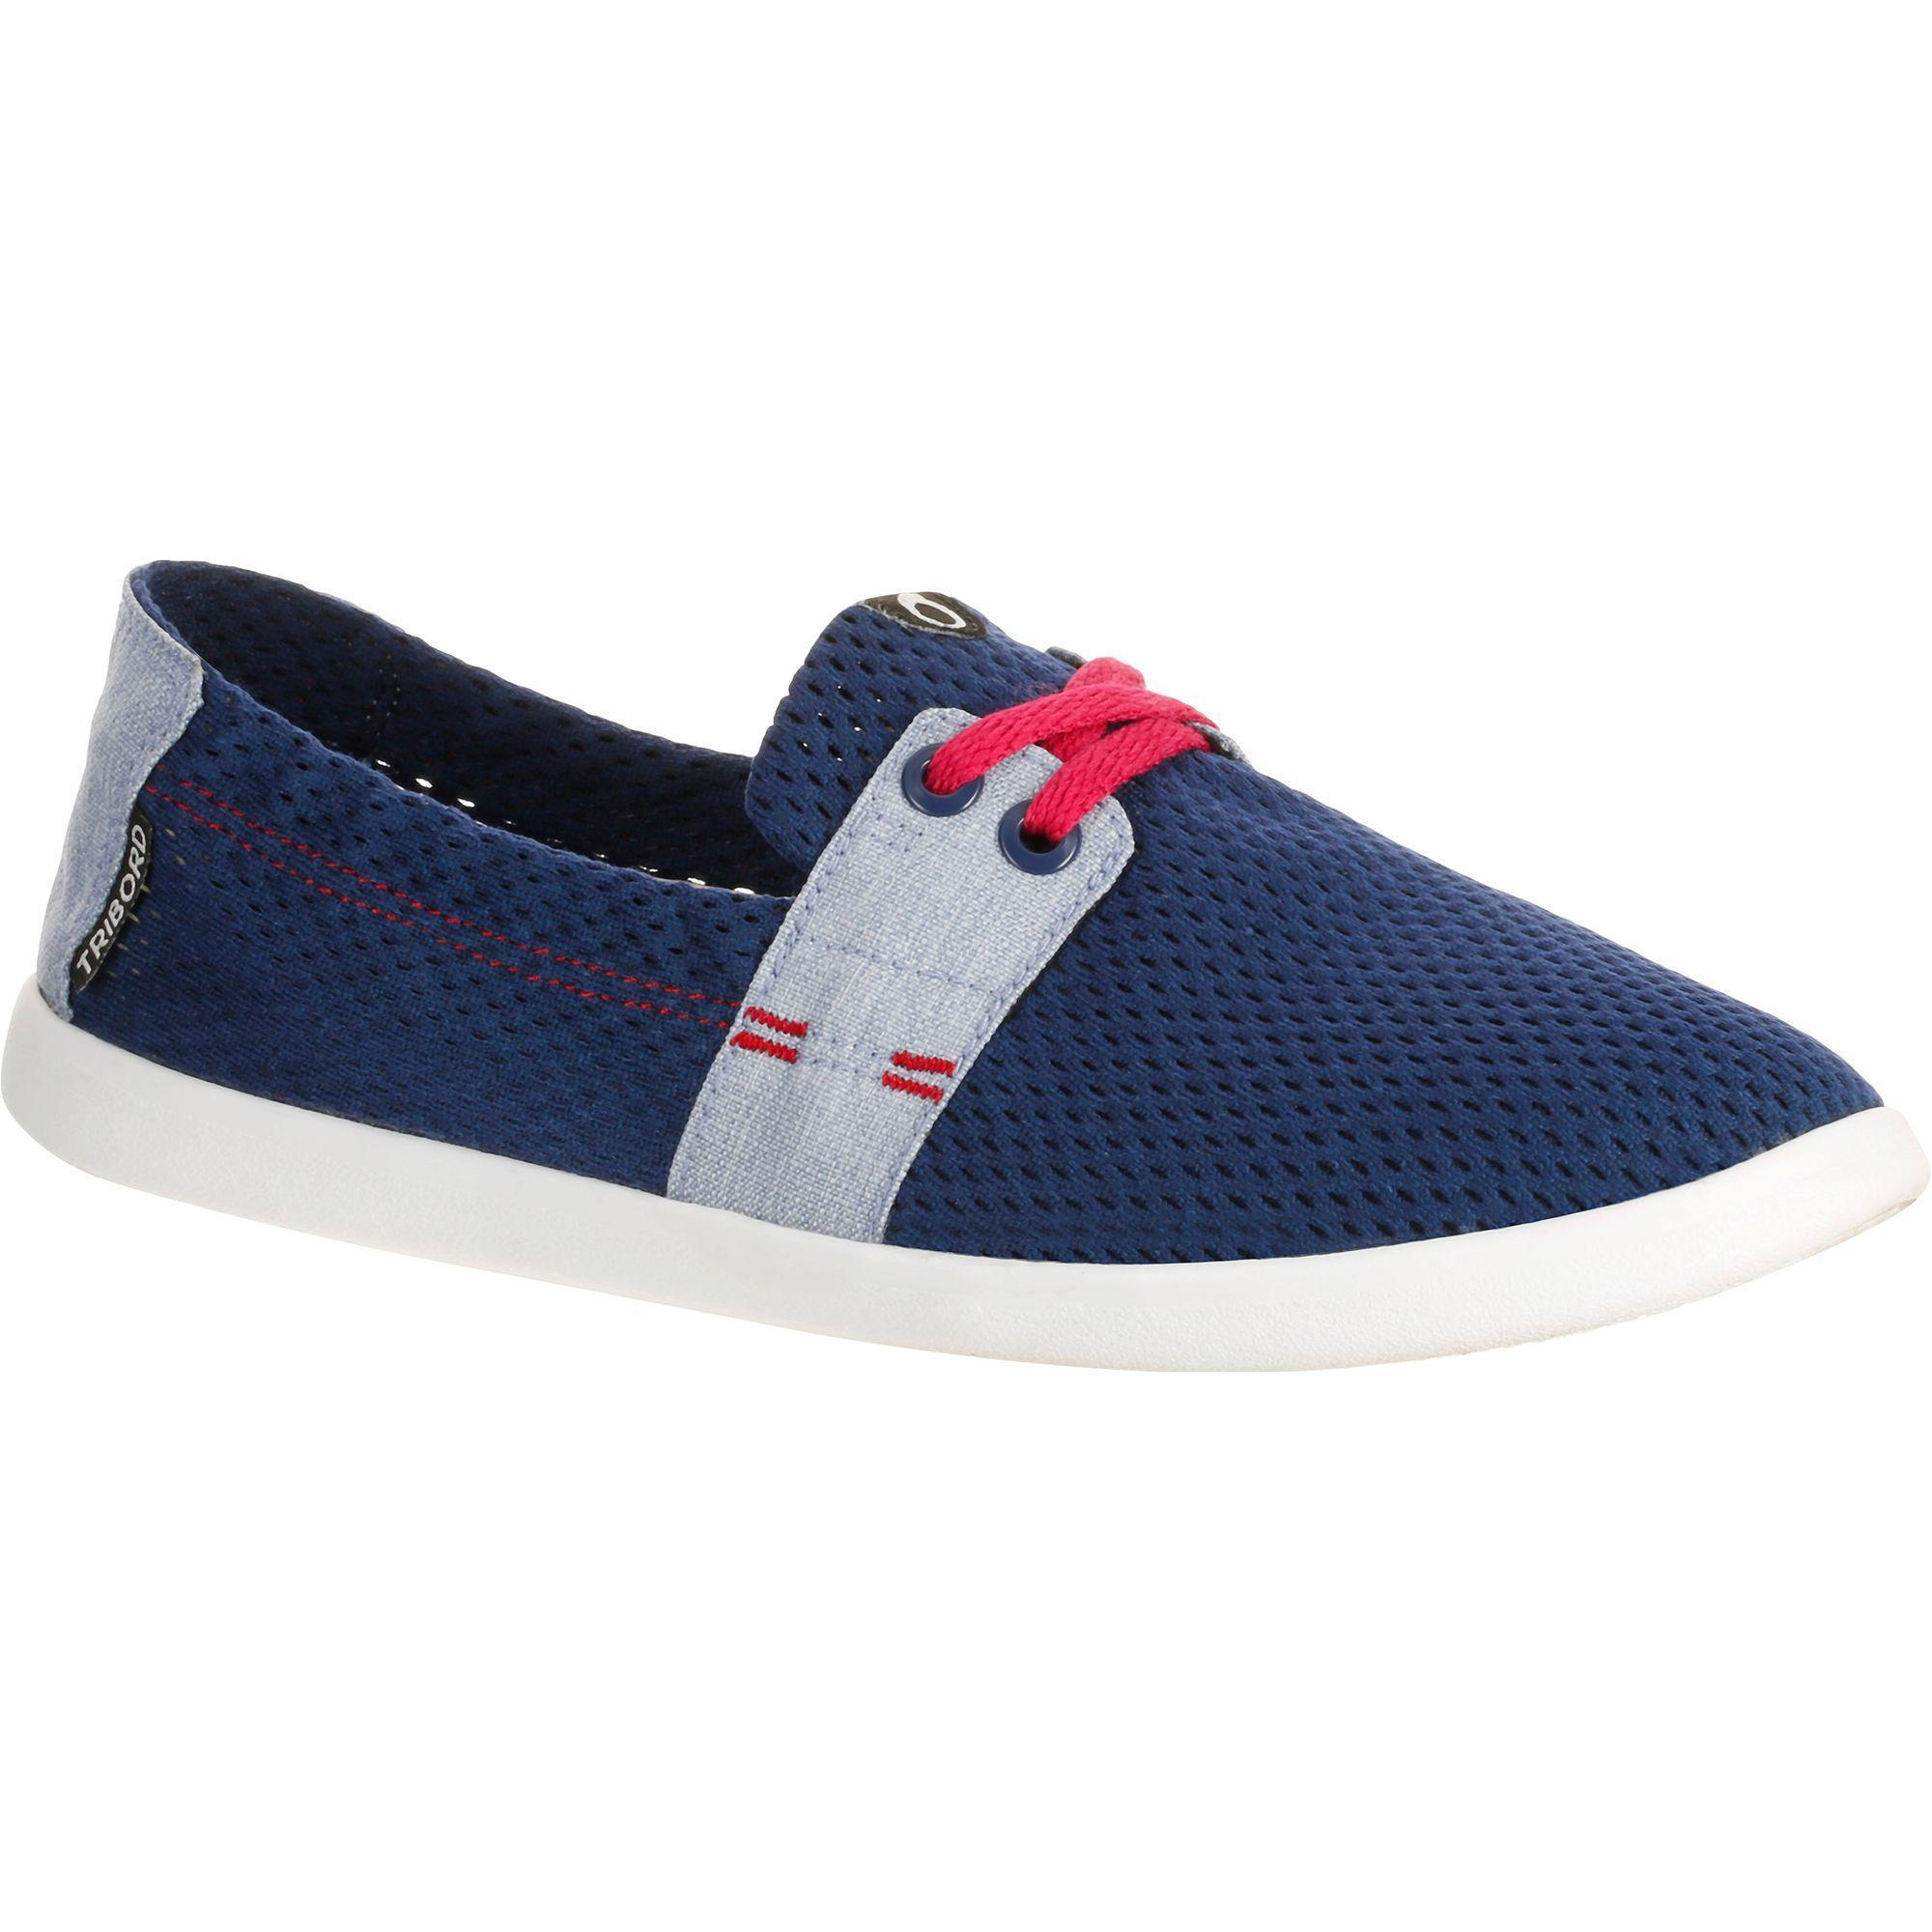 mujer playa Zapatos de AREETA W azul qAn4Ep 84b41505a9c